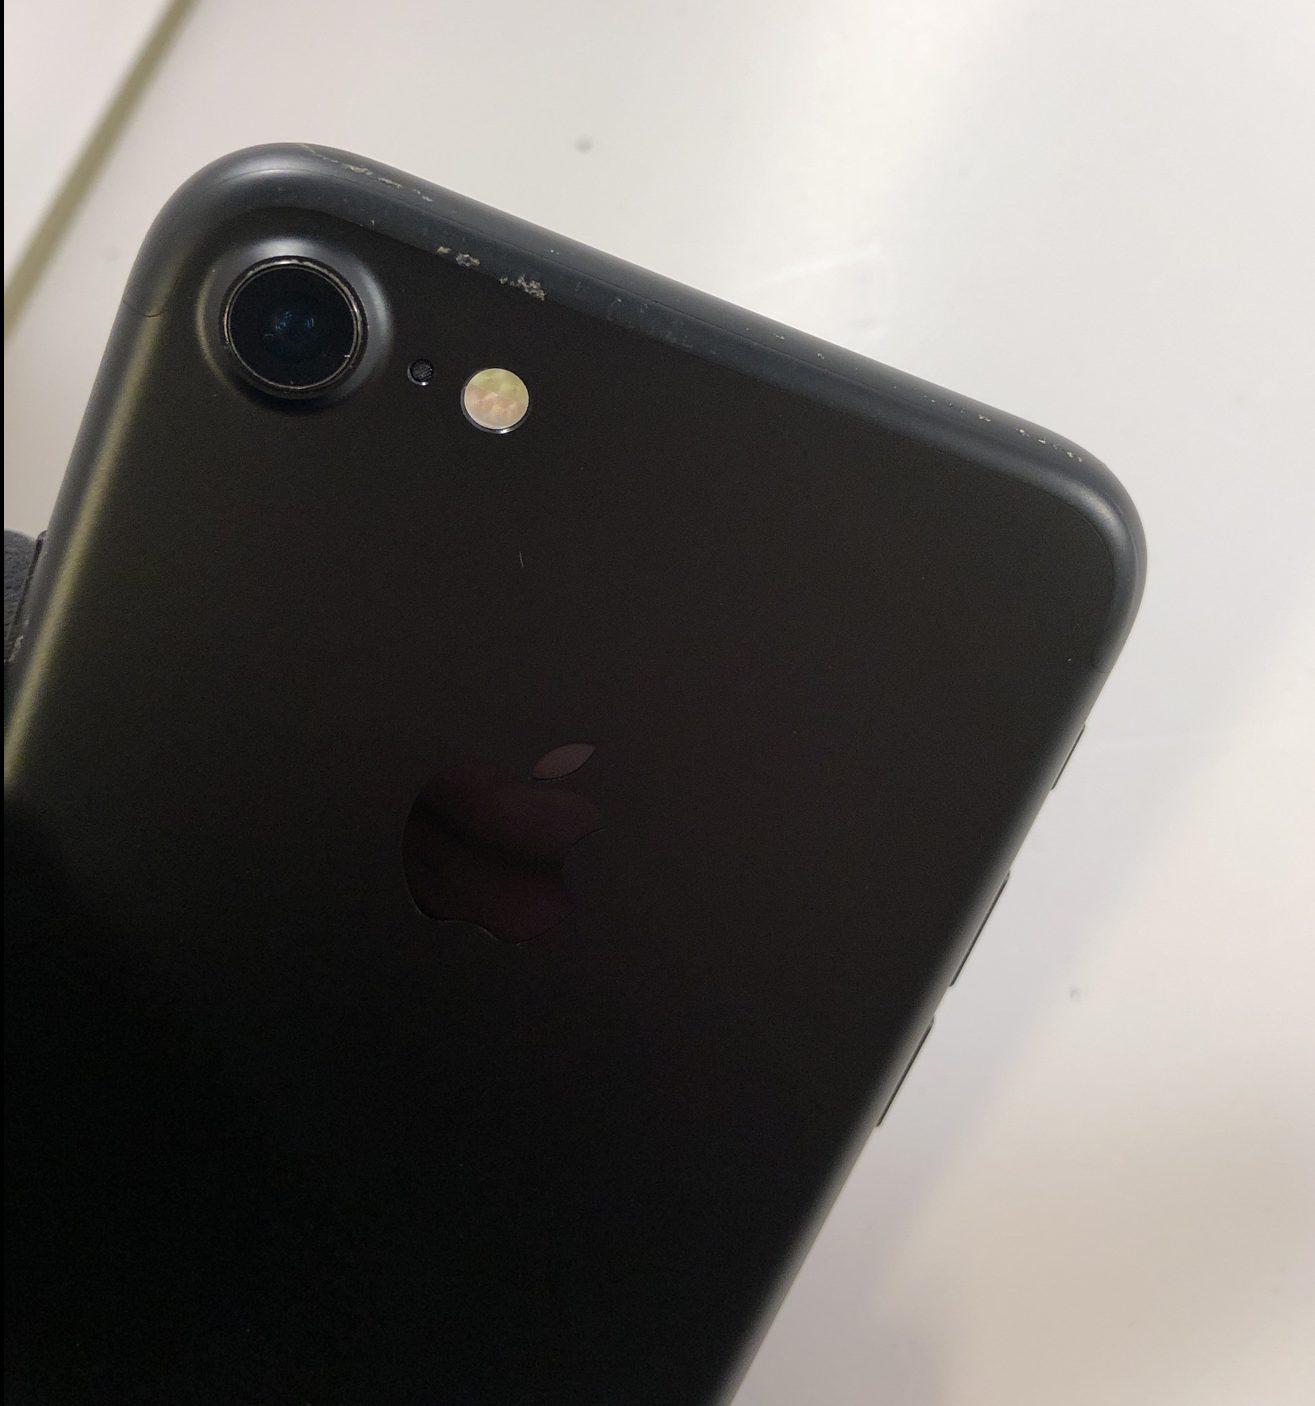 iPhone 7 32GB, 32GB, Black, Afbeelding 4